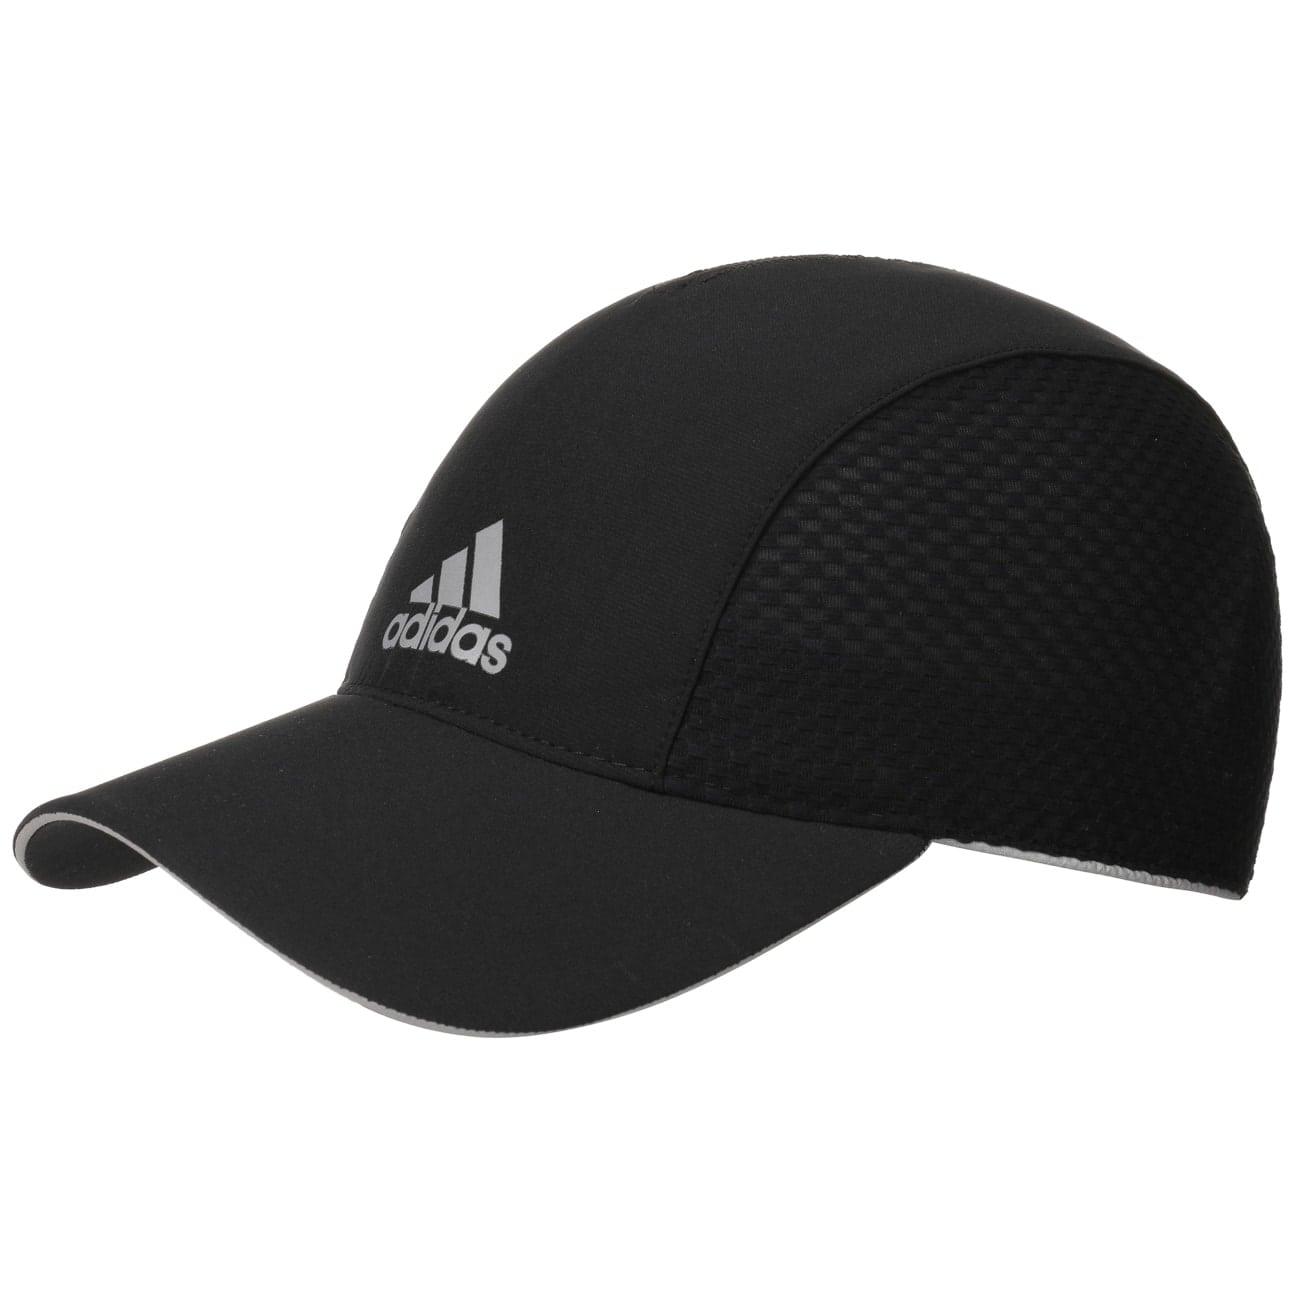 Gorra Run Climacool Cap by adidas - Gorras - sombreroshop.es 2352d1b79cc